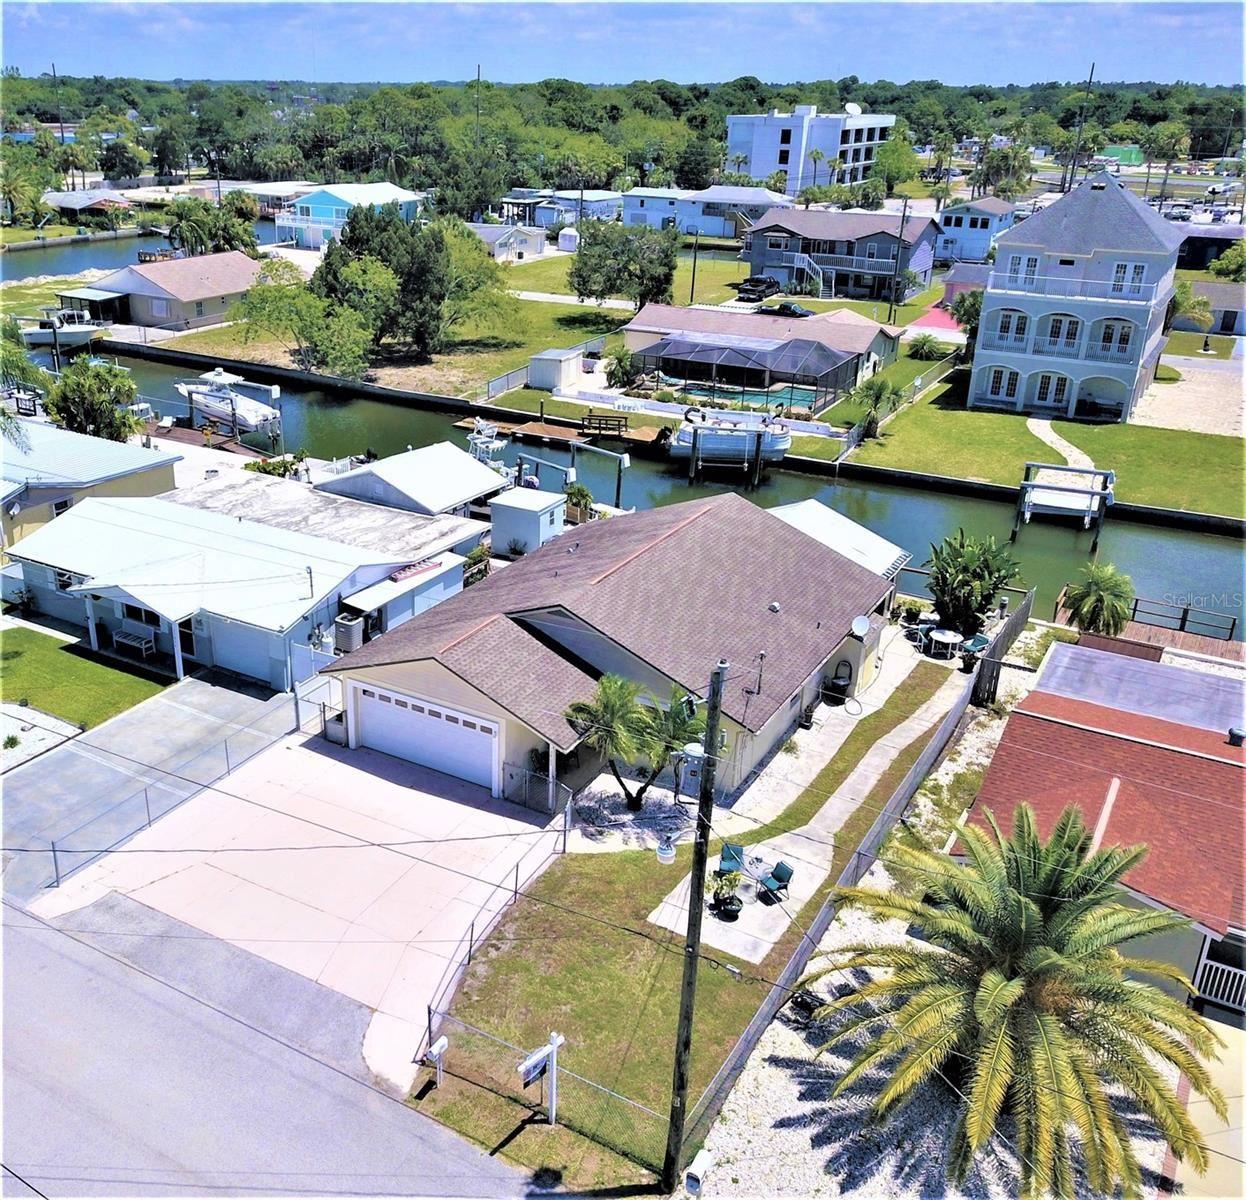 13802 MELANIE AVENUE, Hudson, FL 34667 - MLS#: W7833289